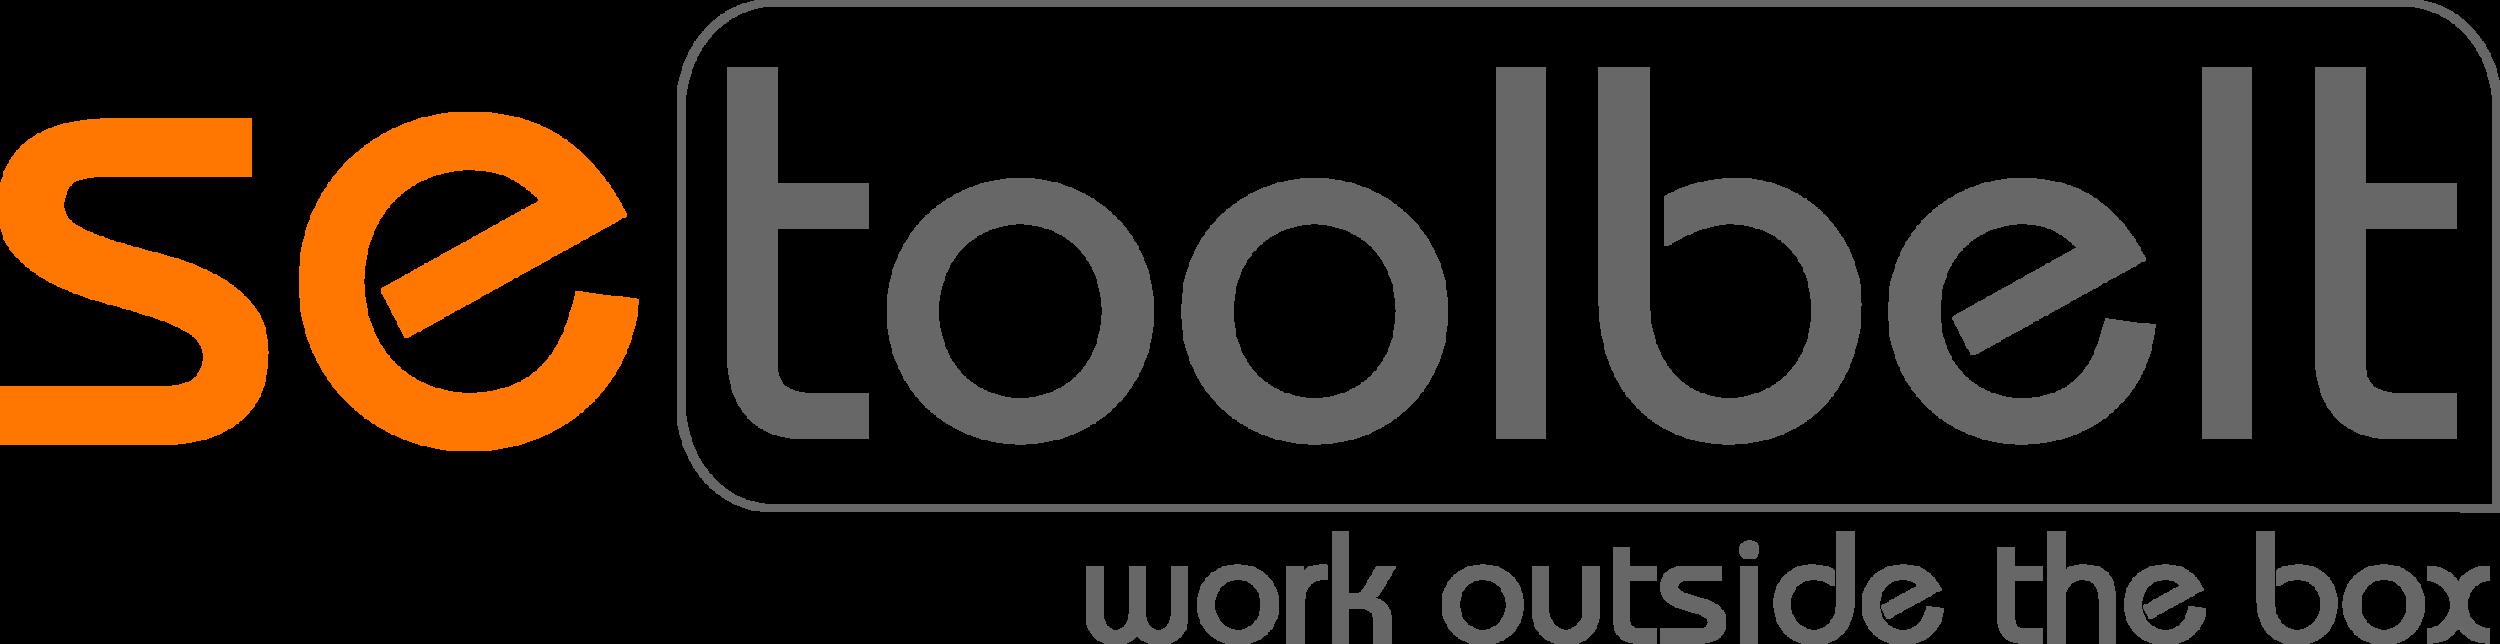 SEToolbelt_logo.png